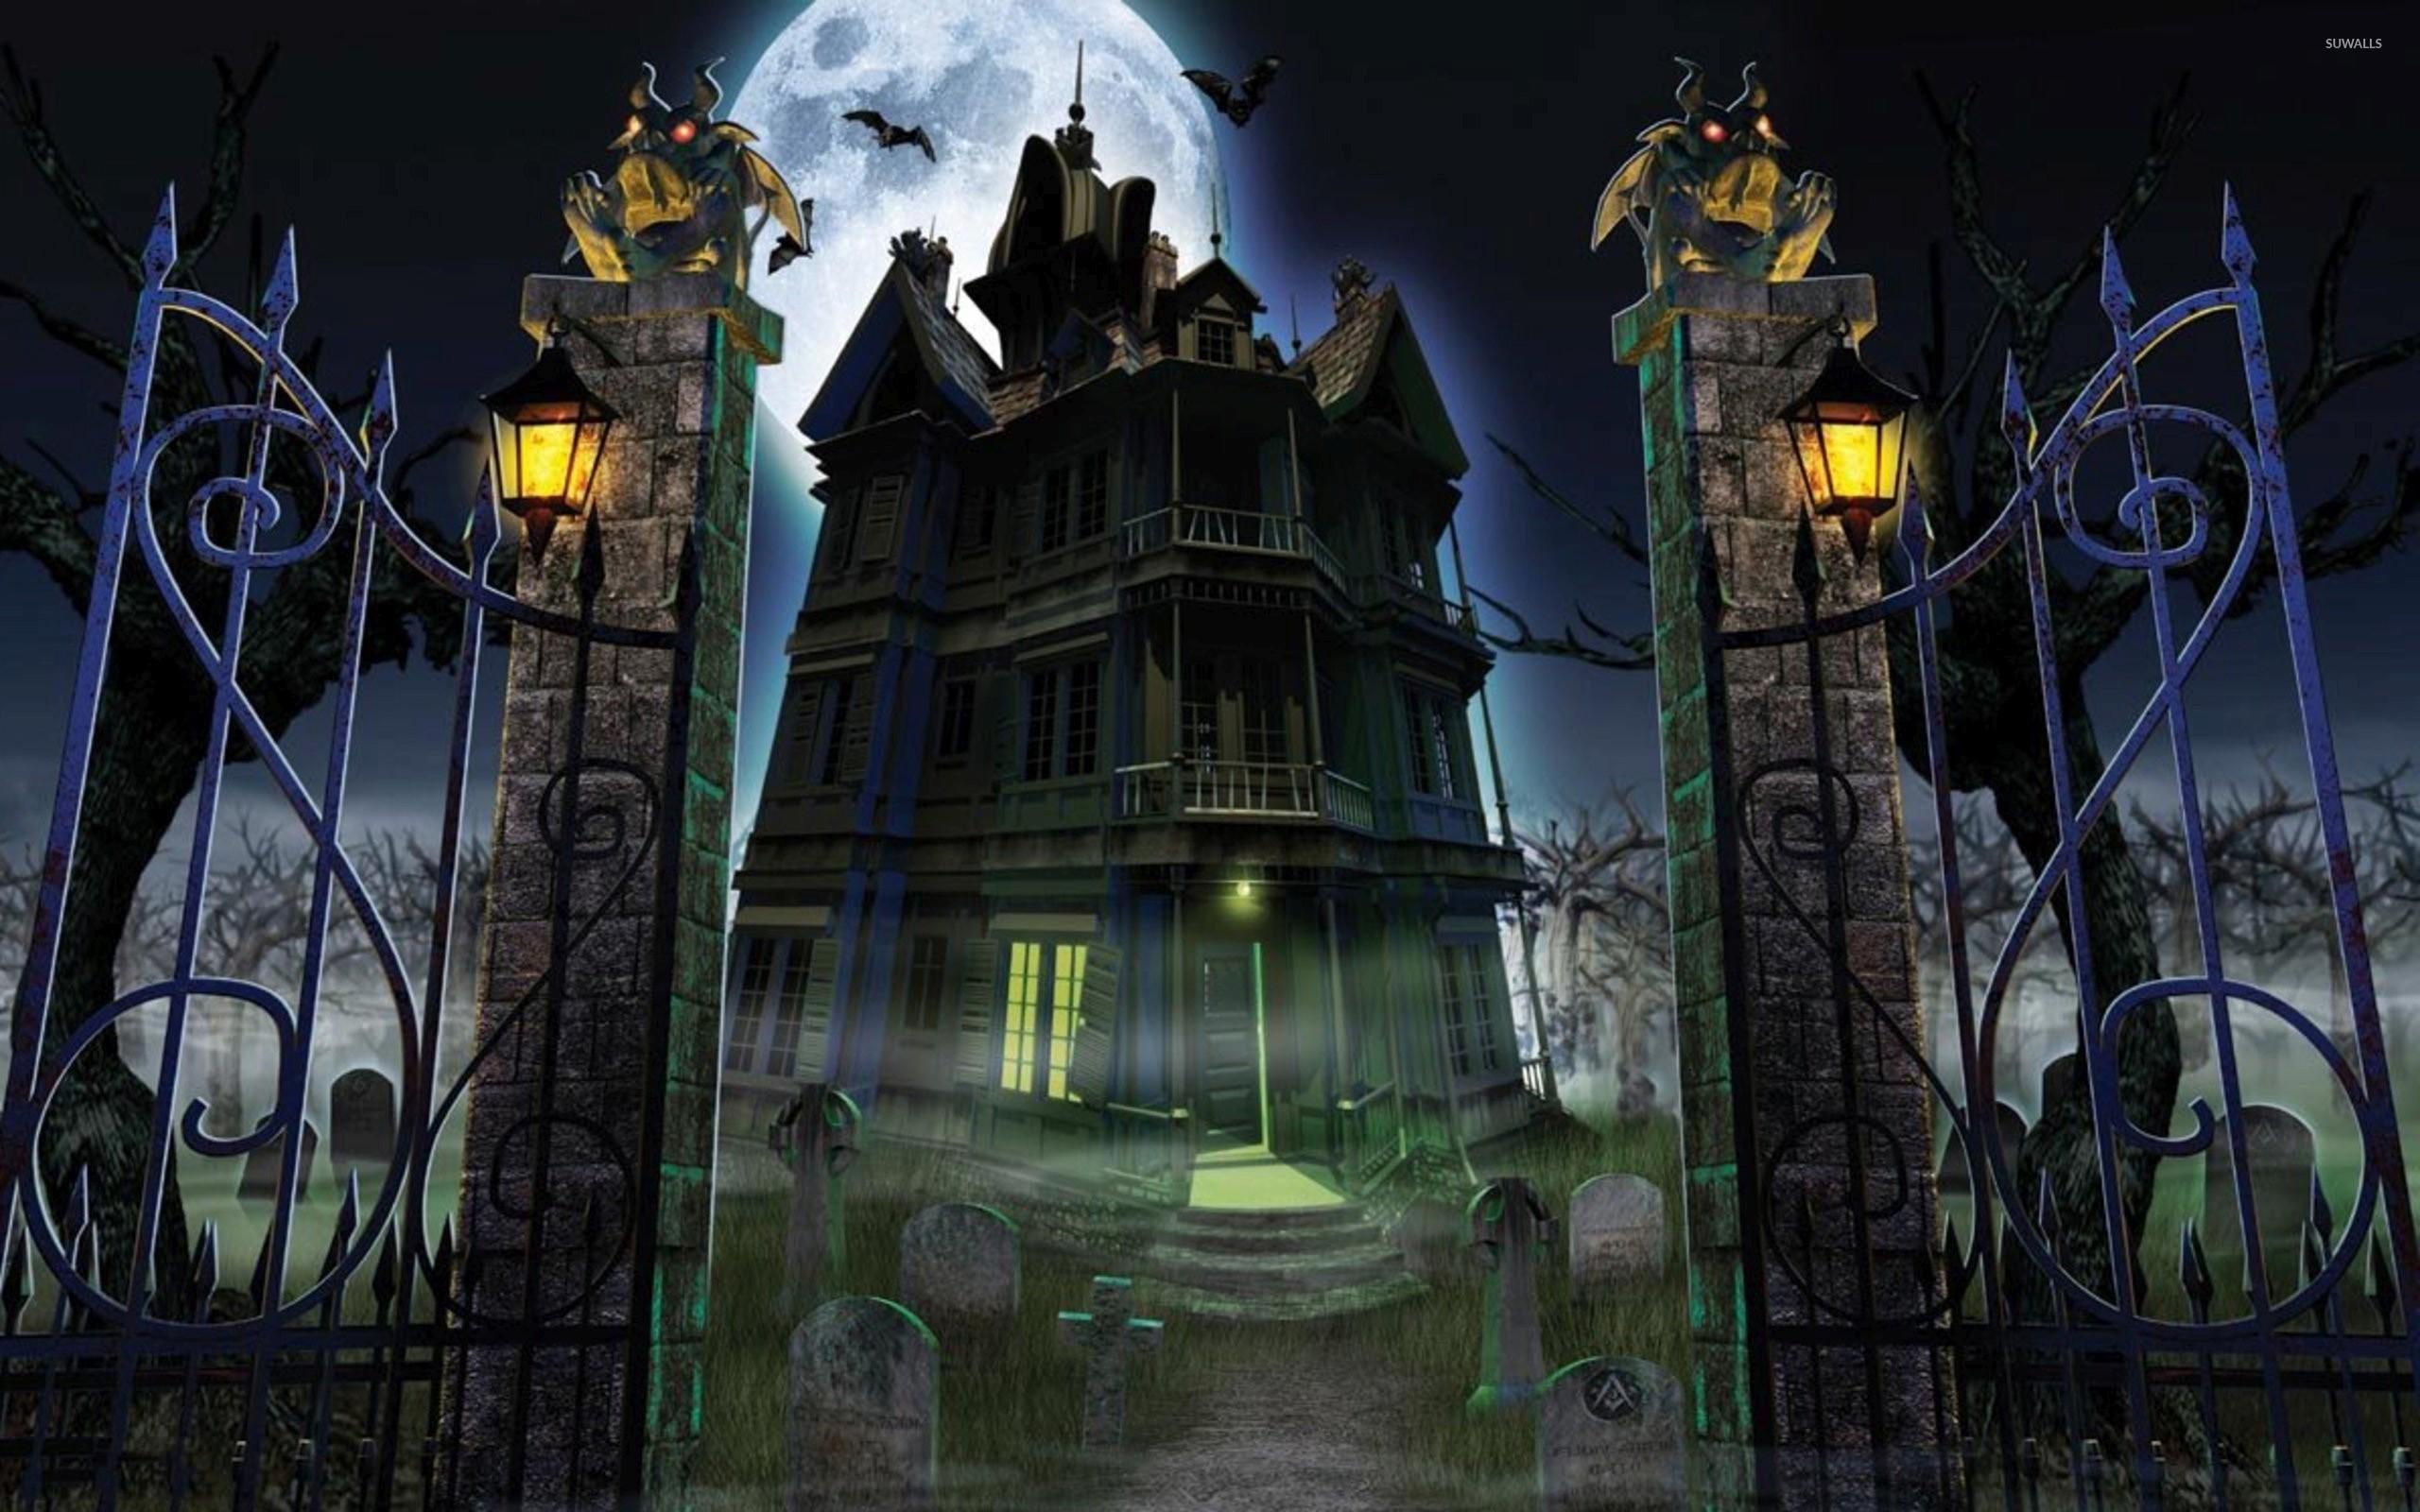 disney haunted mansion wallpaper fabric – photo #1. Disney Pillow Pet  Sorcerer Mickey Mouse Light Up